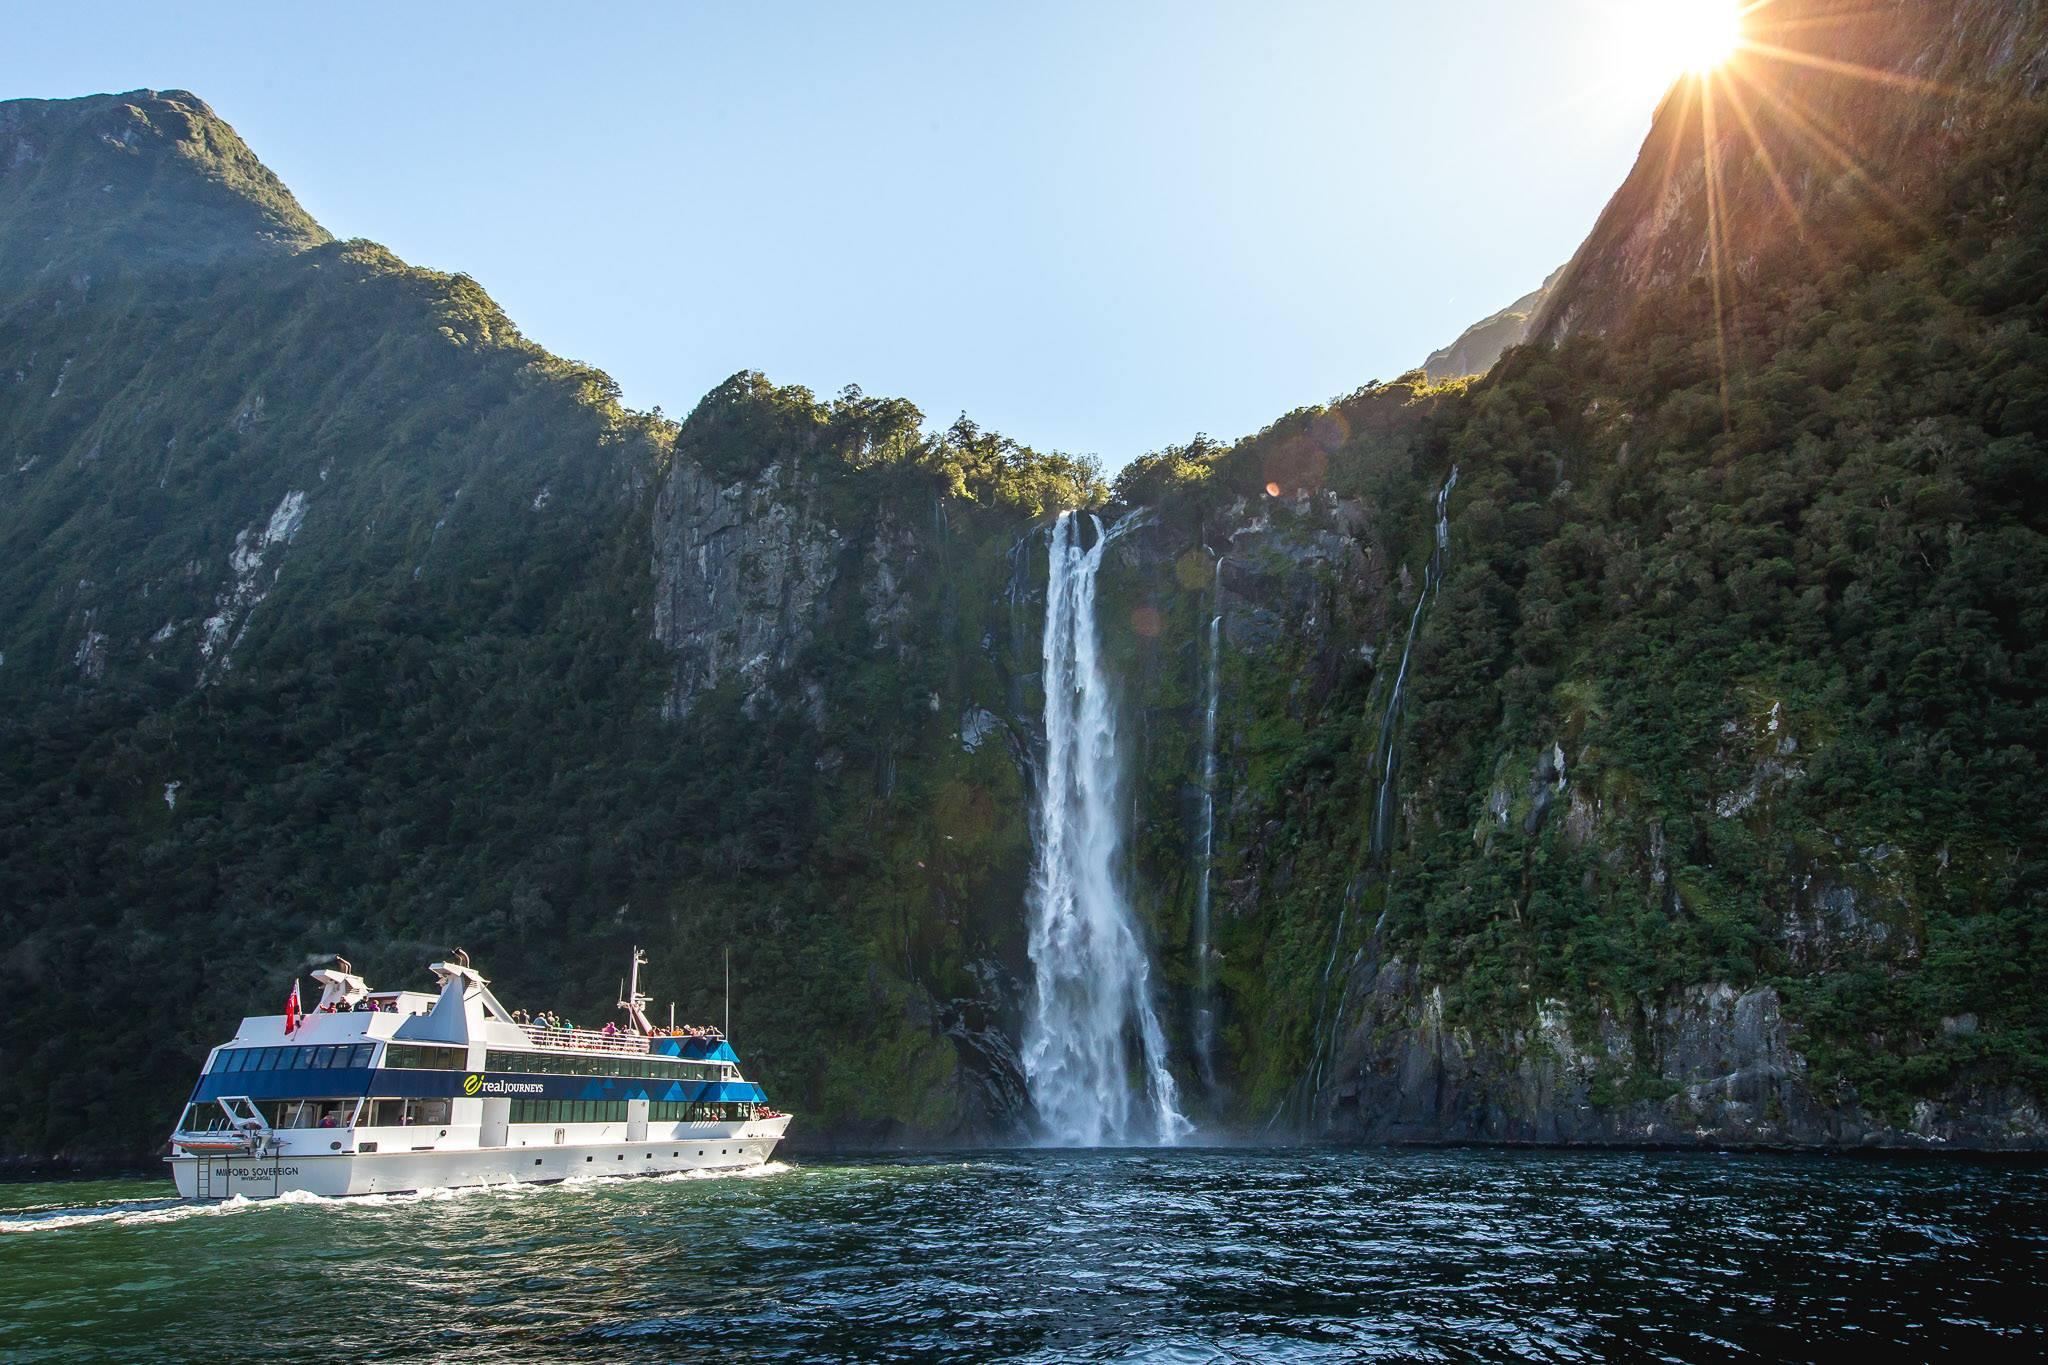 Milford Sound, Fiordland, New Zealand attractions, New Zealand activities